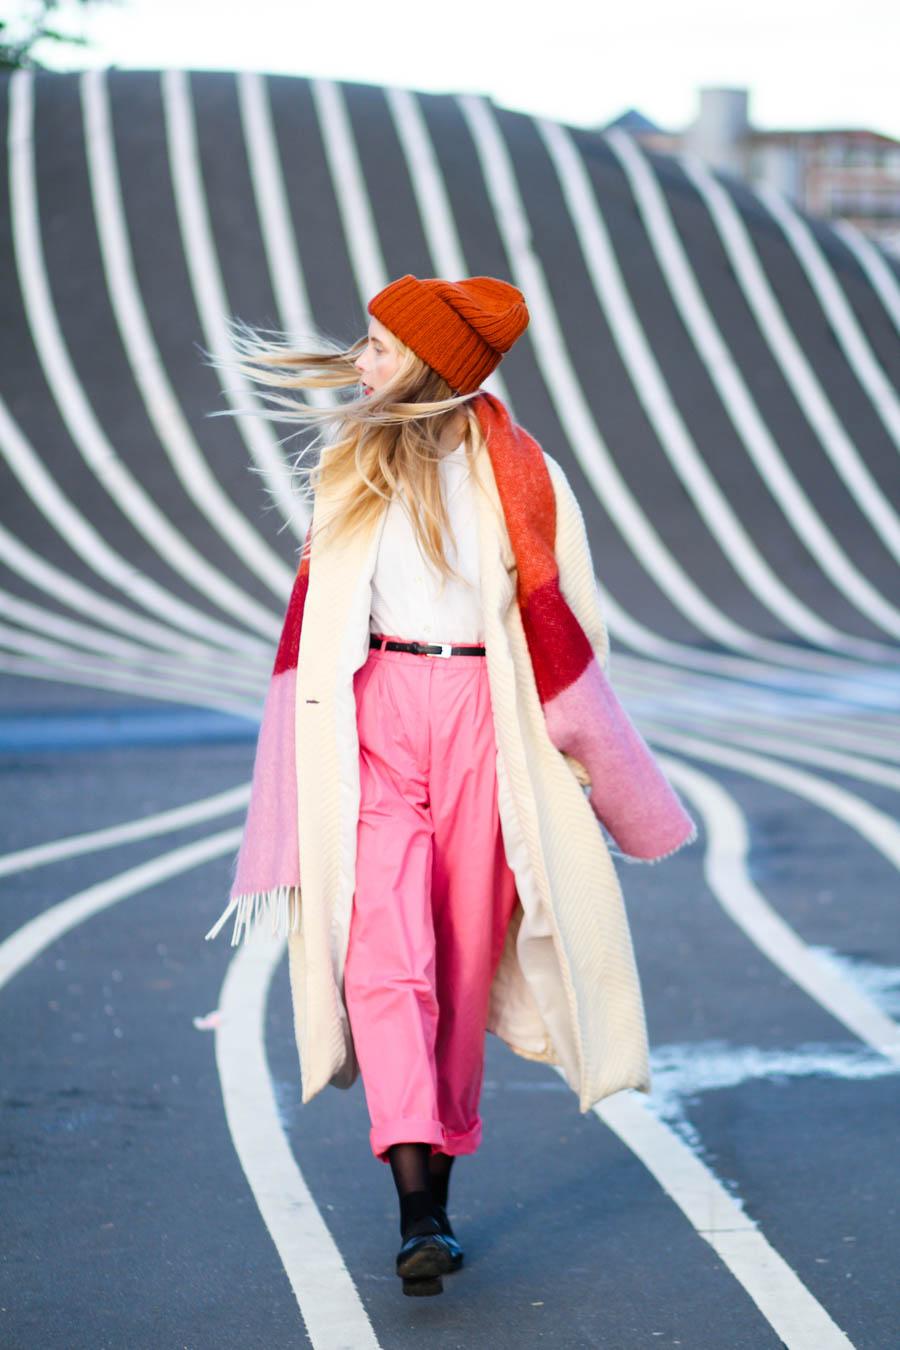 outfit january nemesis babe marie jensen danish blogger -7